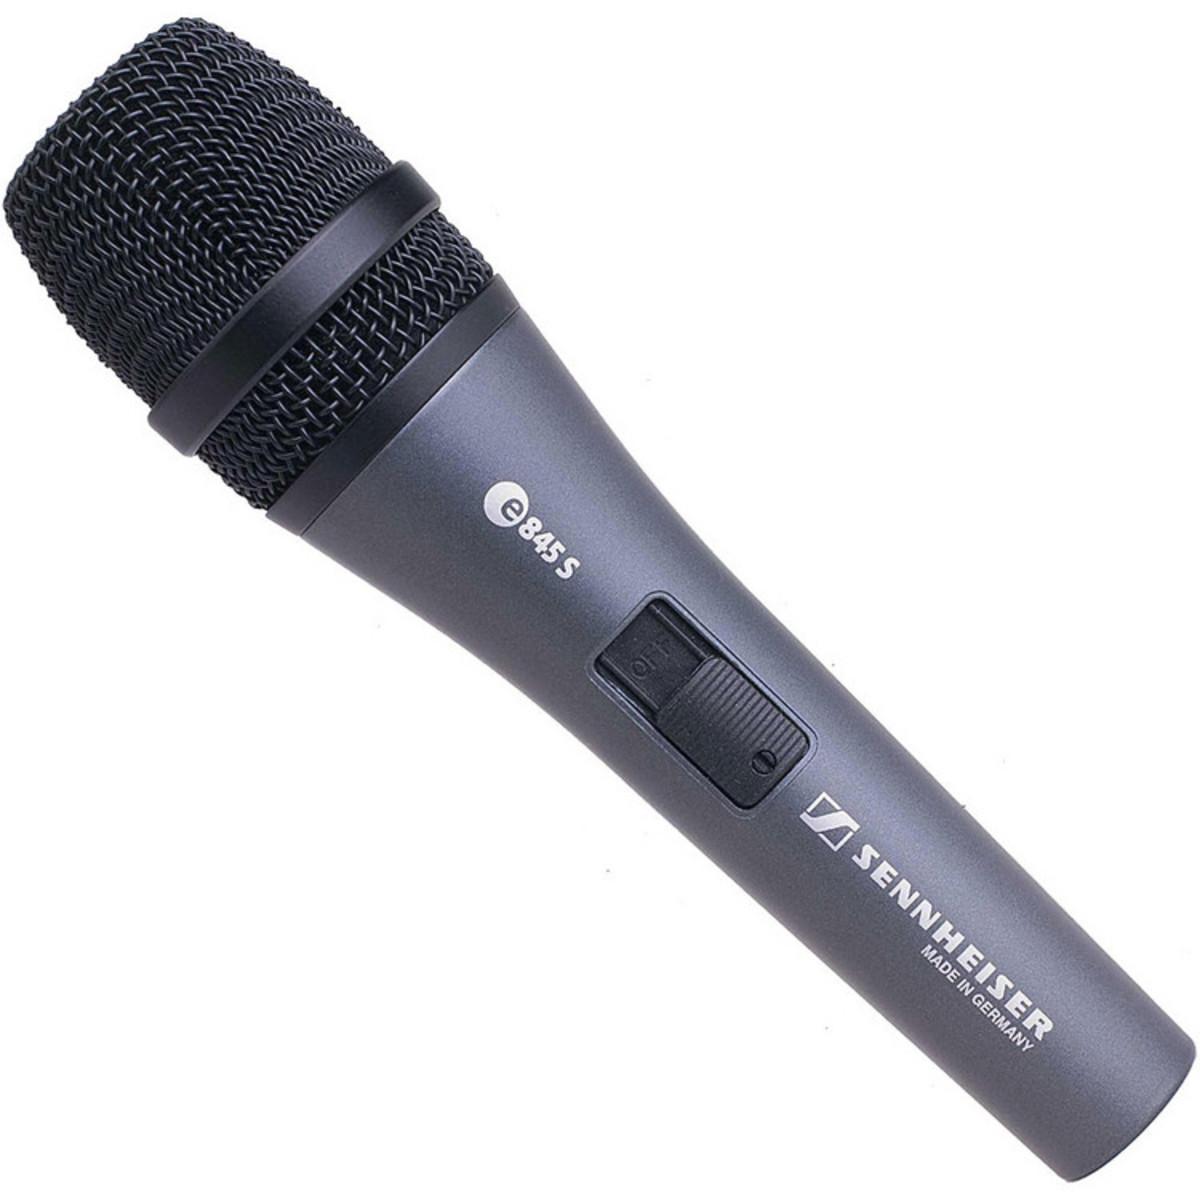 Sennheiser E845s Lead Vocal Microphone Switch Box Opened